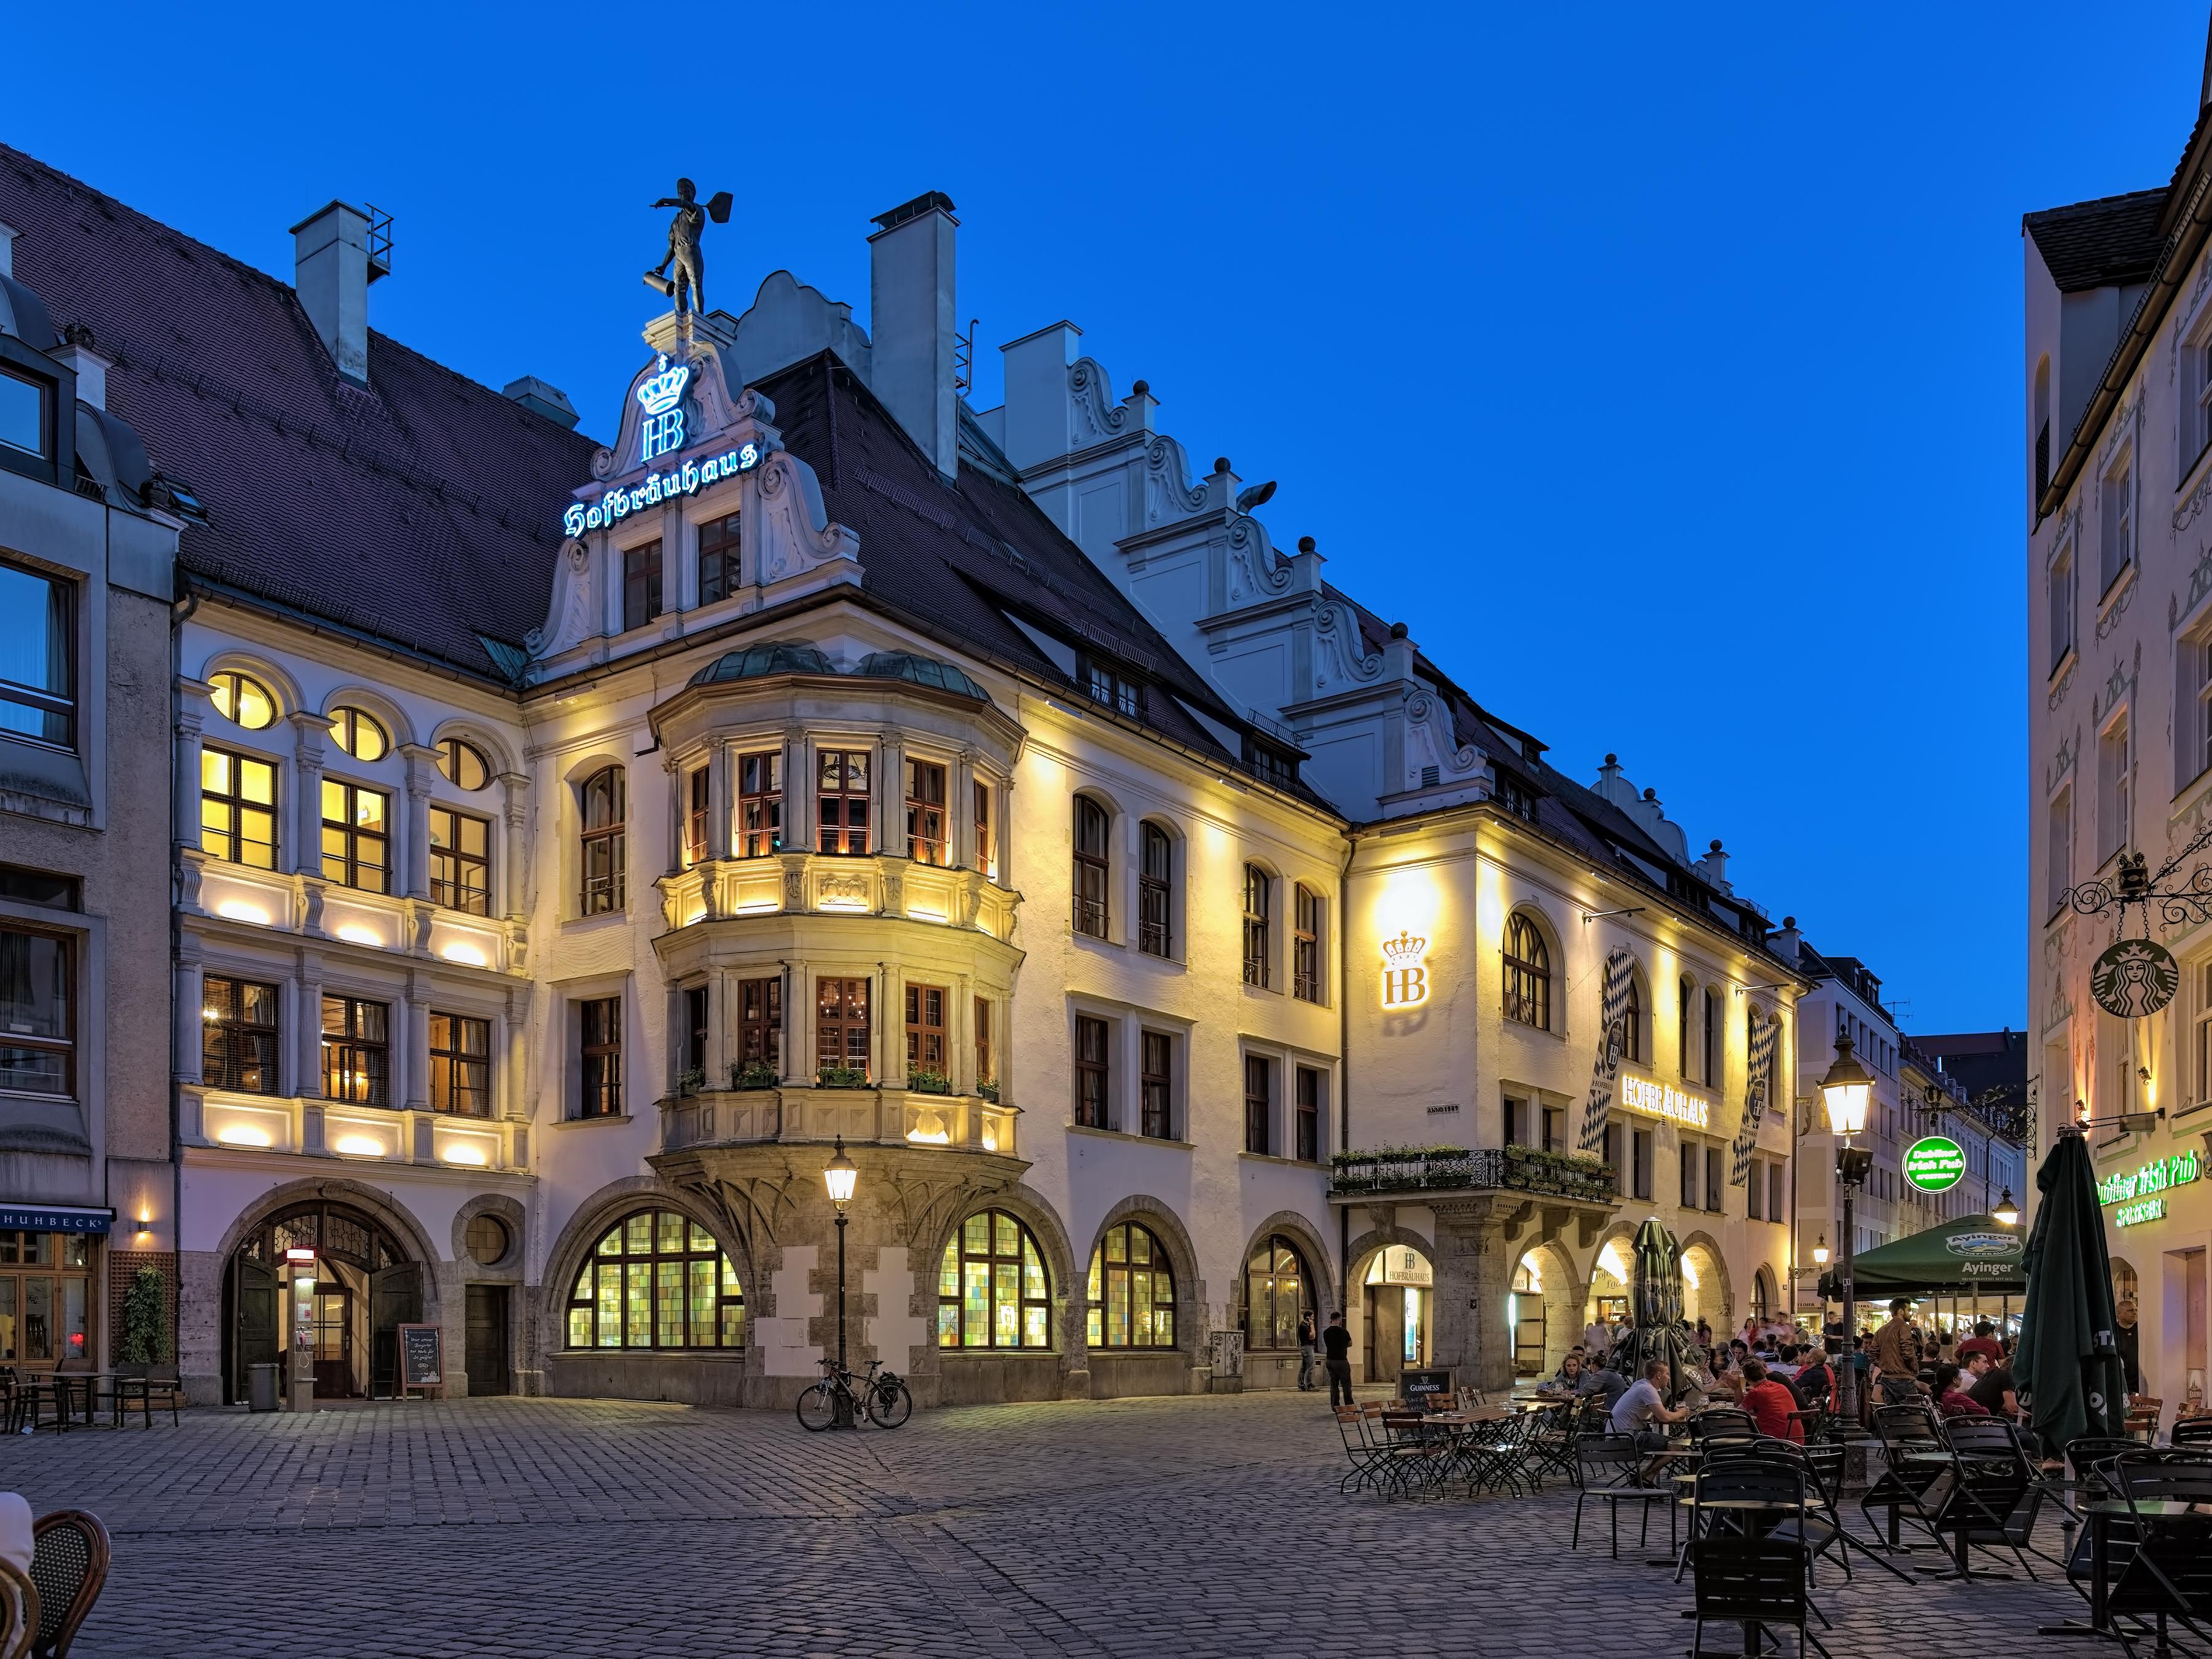 Hofbräuhaus am Platzl, el icono de la cerveza en Munich